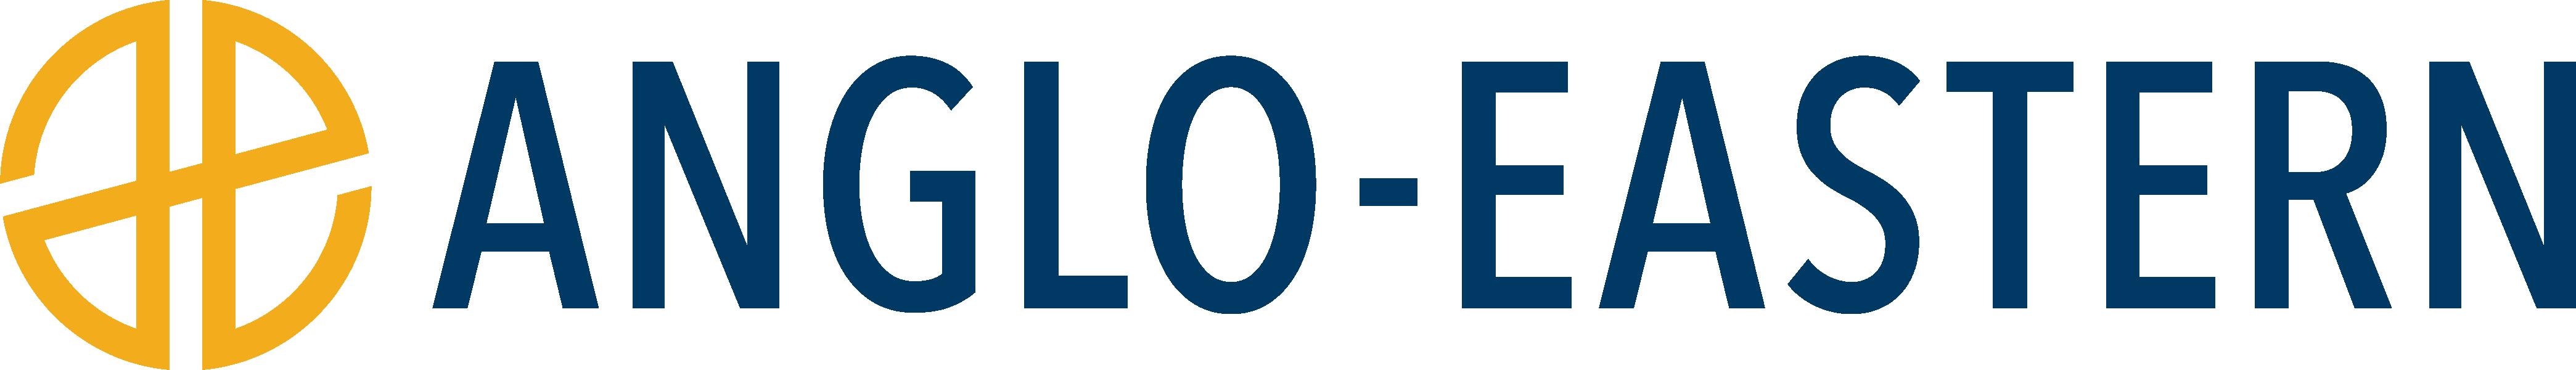 Anglo-Eastern logo